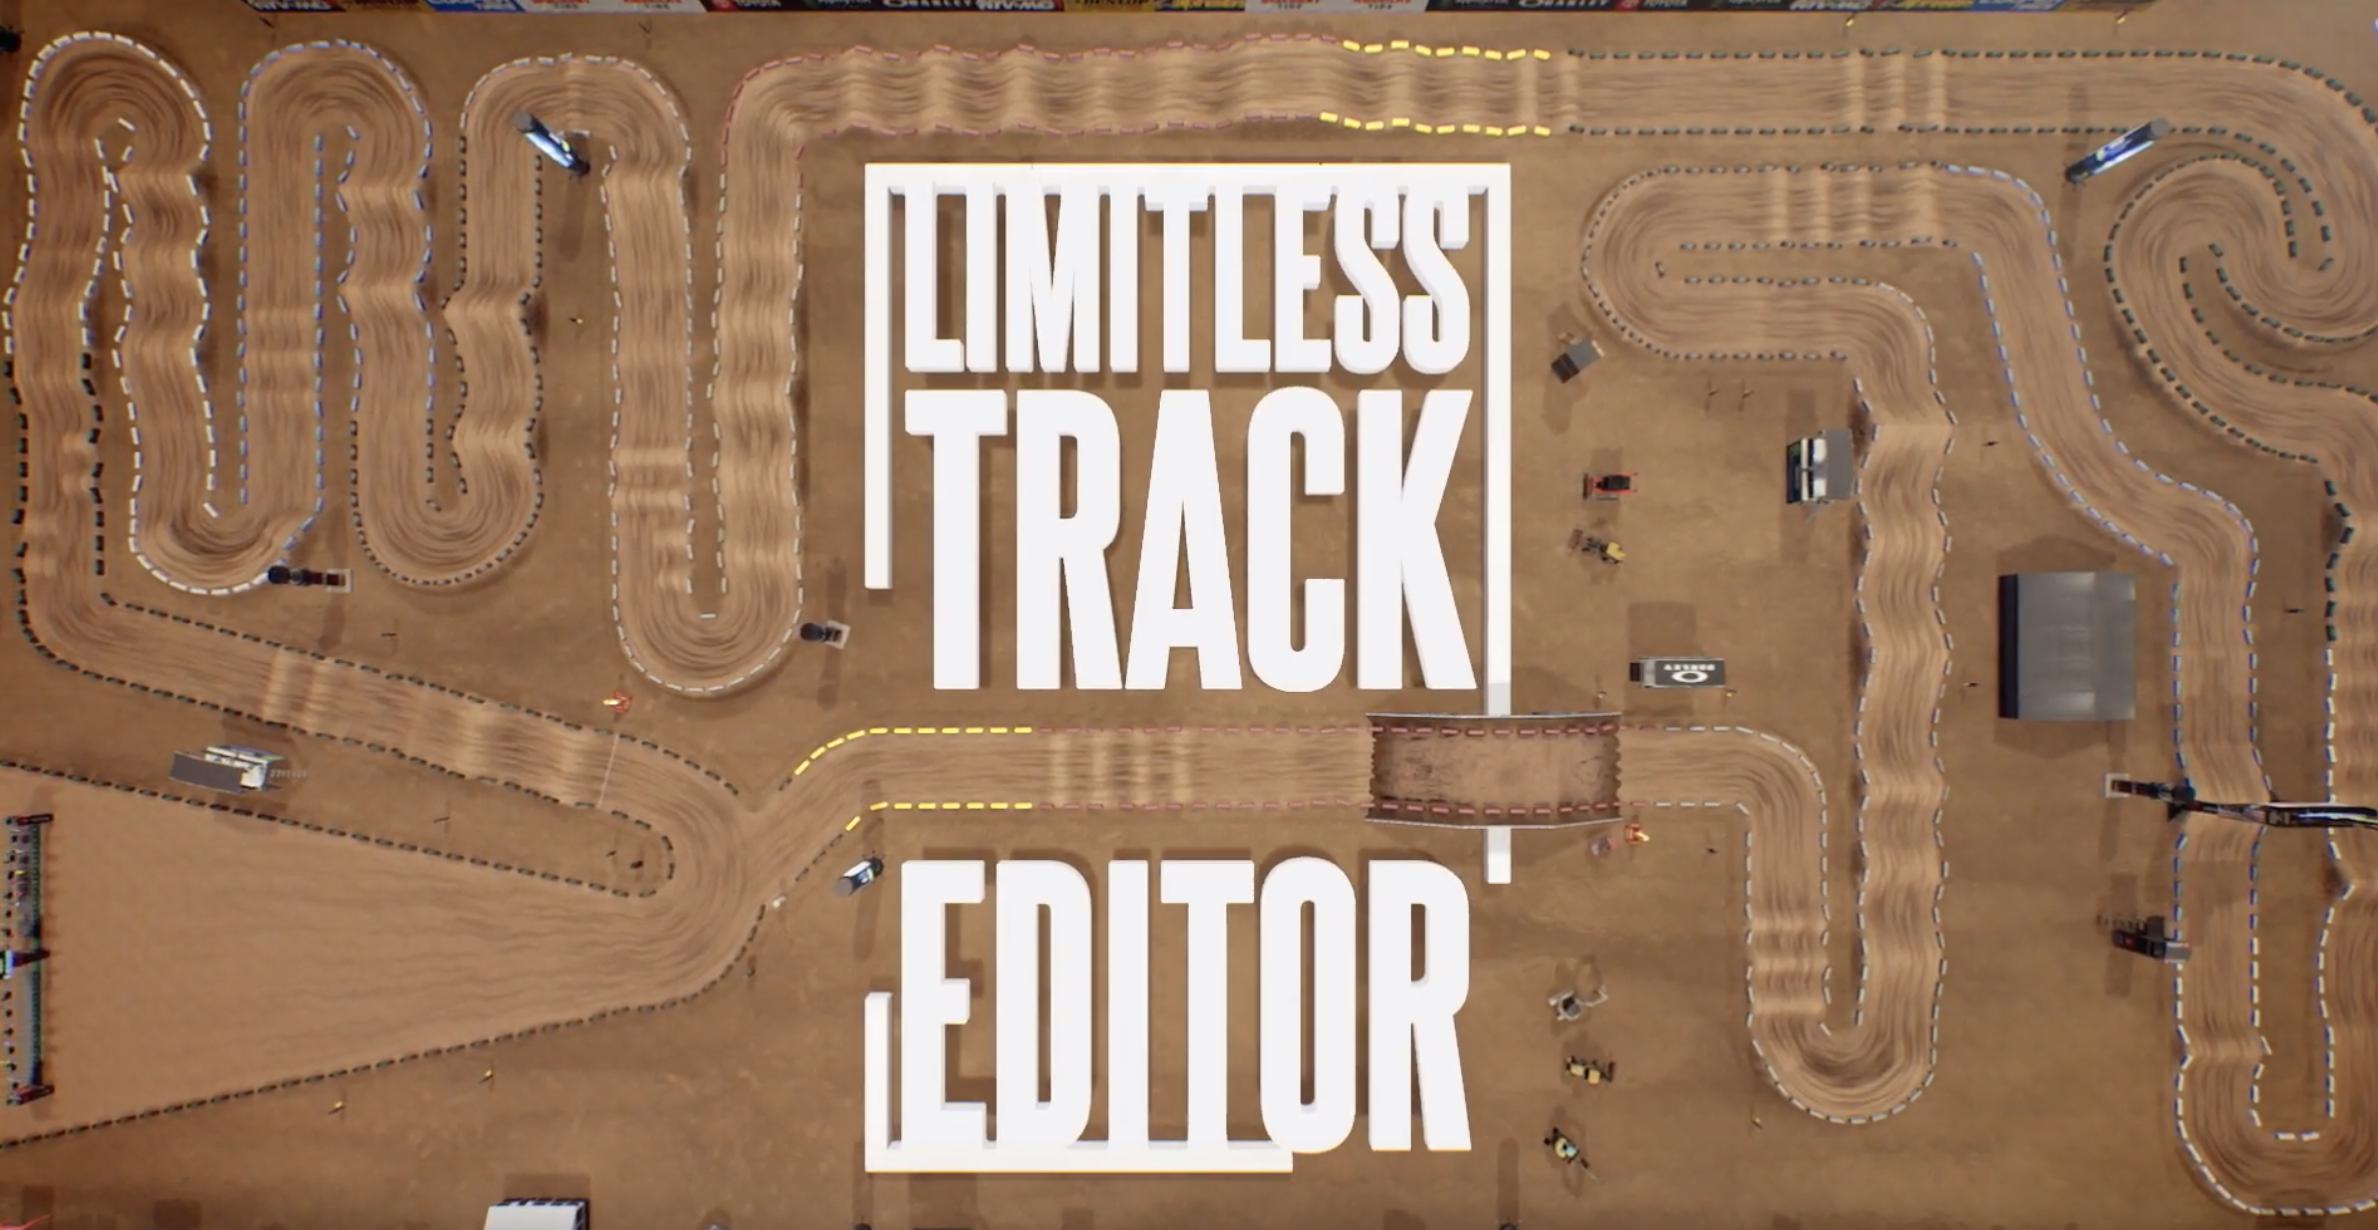 Limitless Track Editor